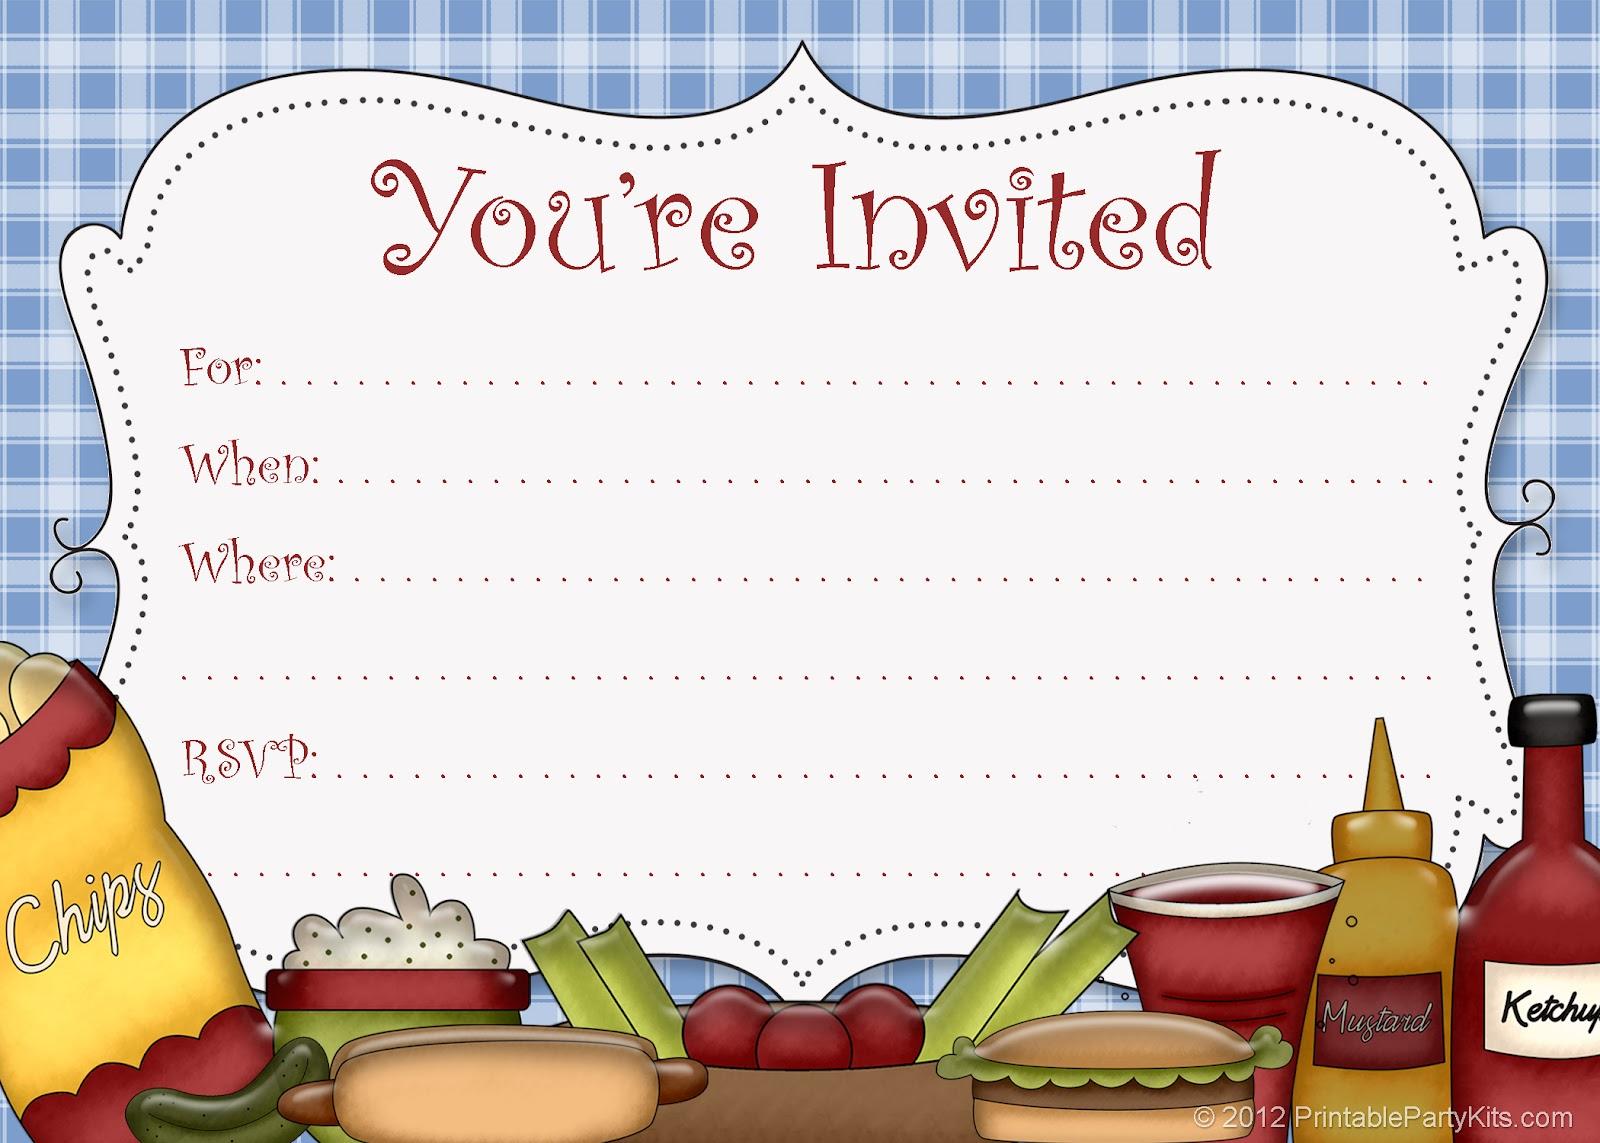 Free Printable Picnic Invitations Templates